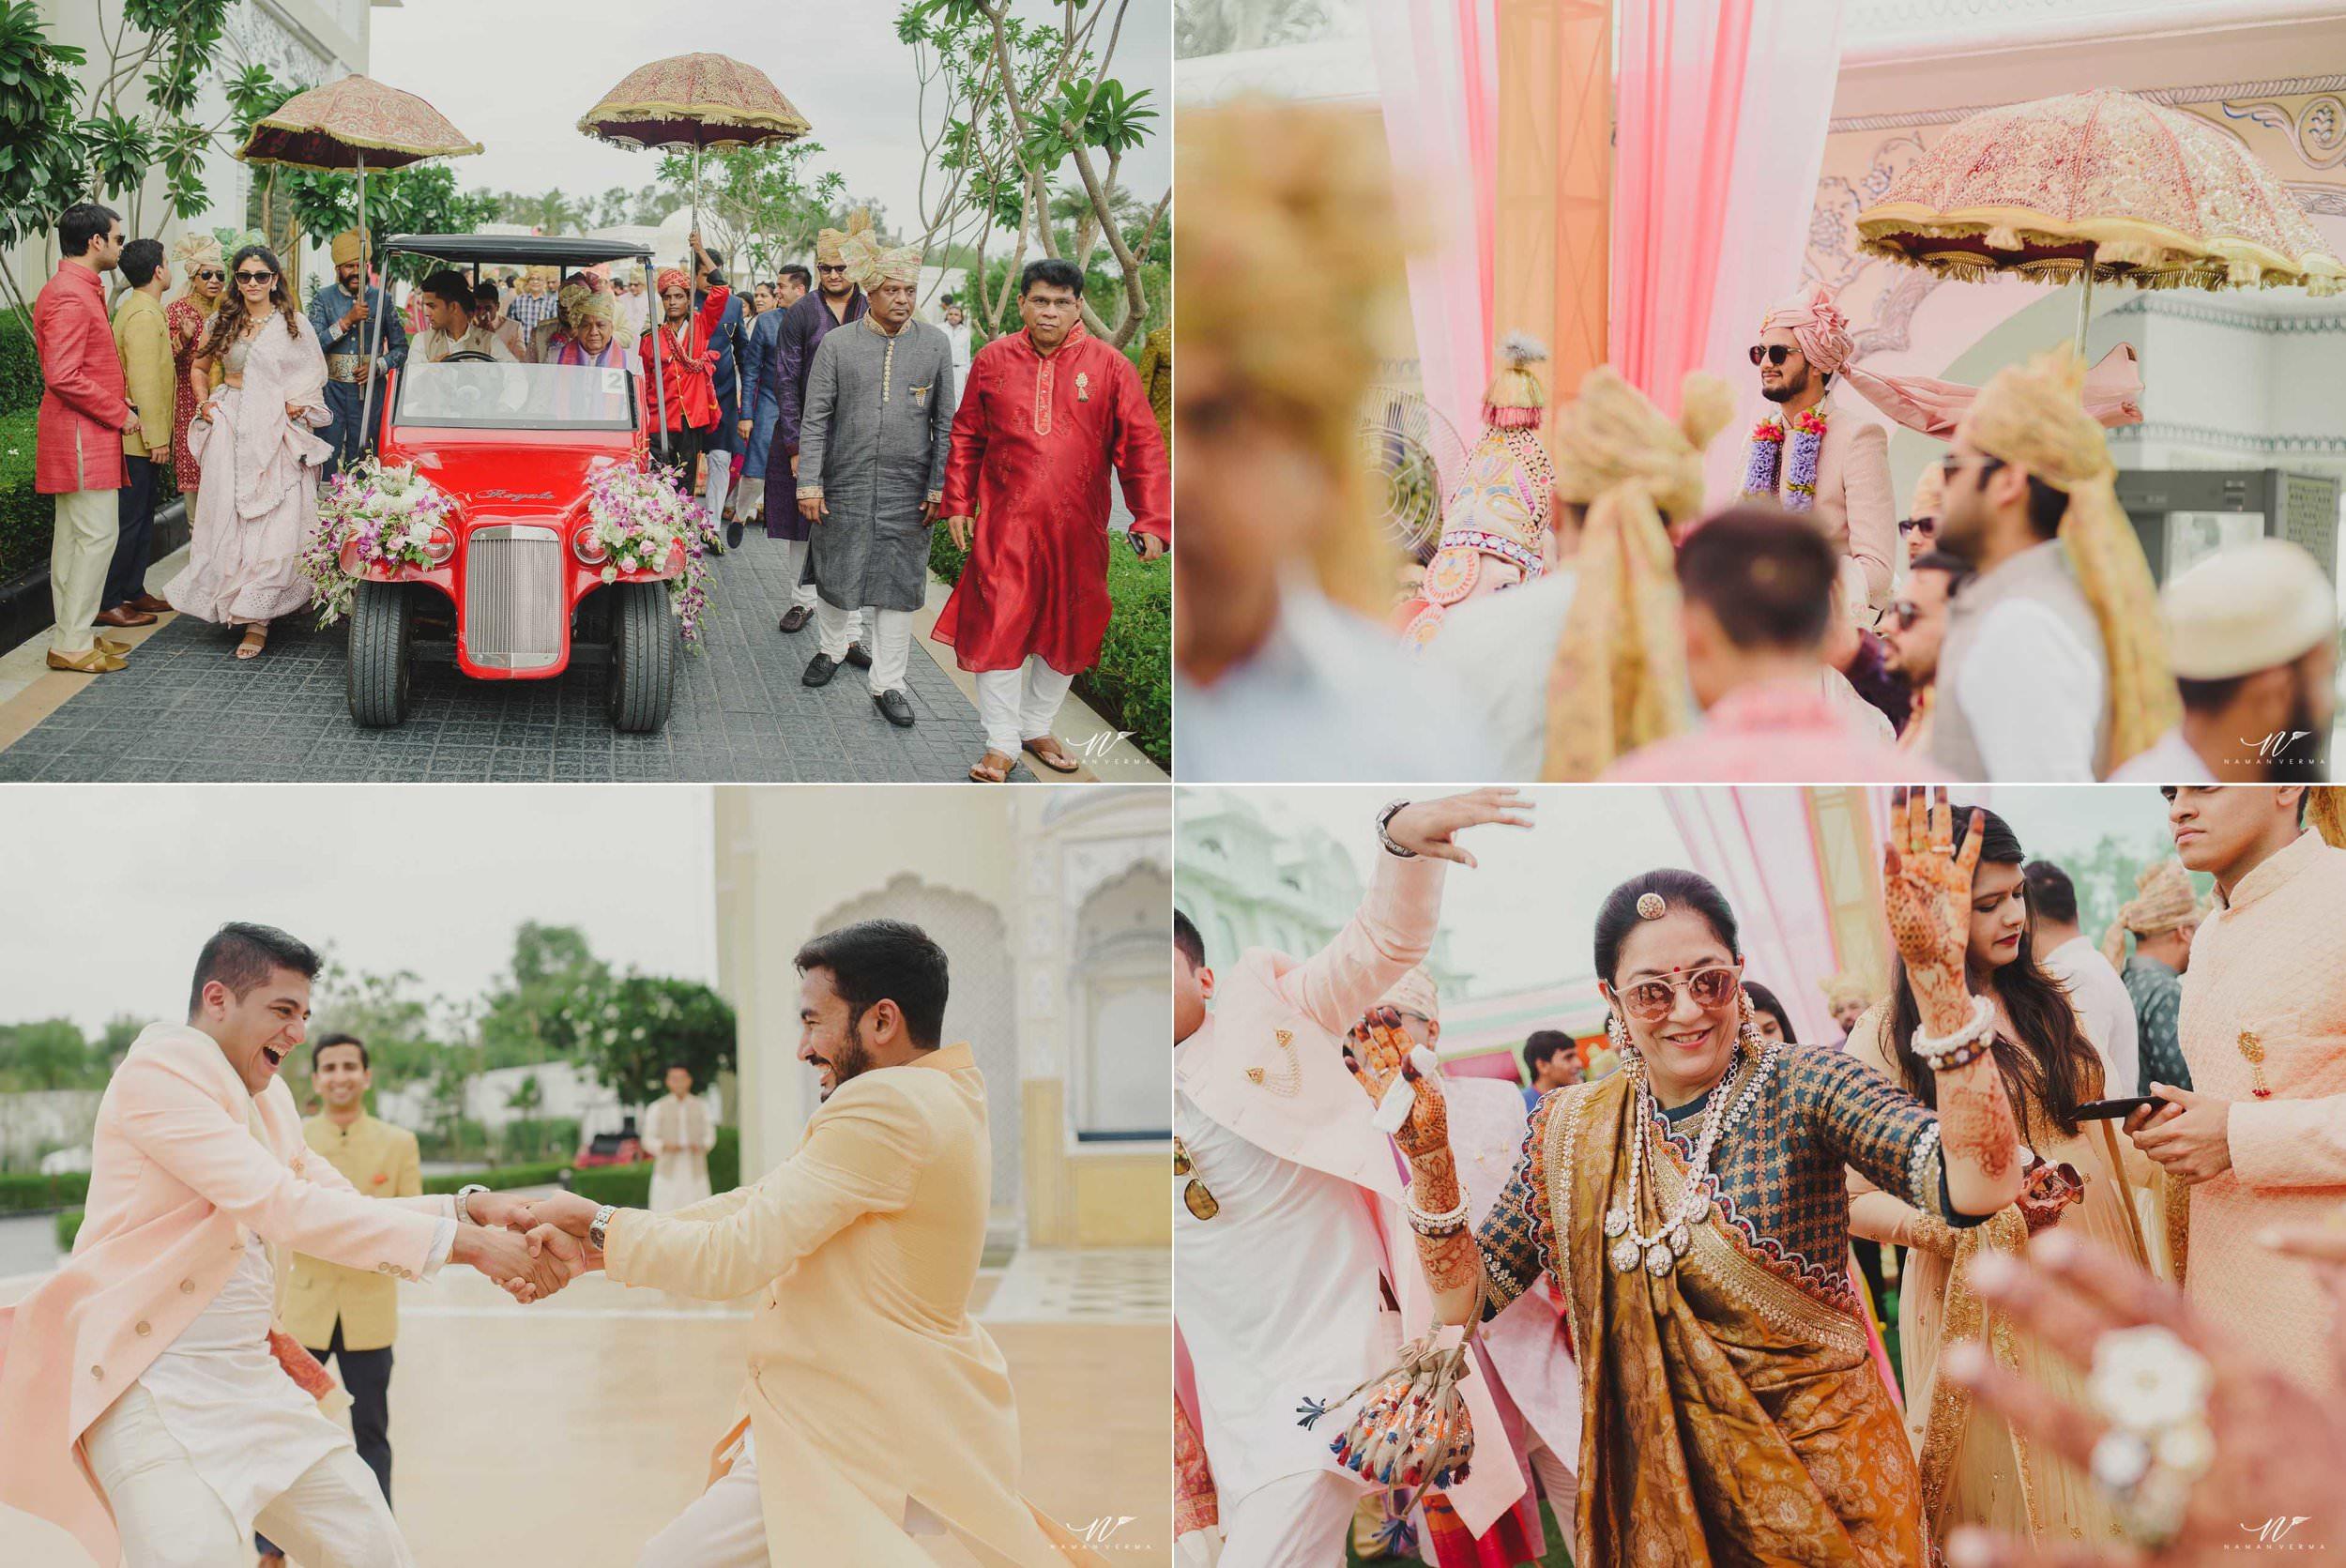 NVP_Vidhi&Rushang_Wedding_323+copy.jpg